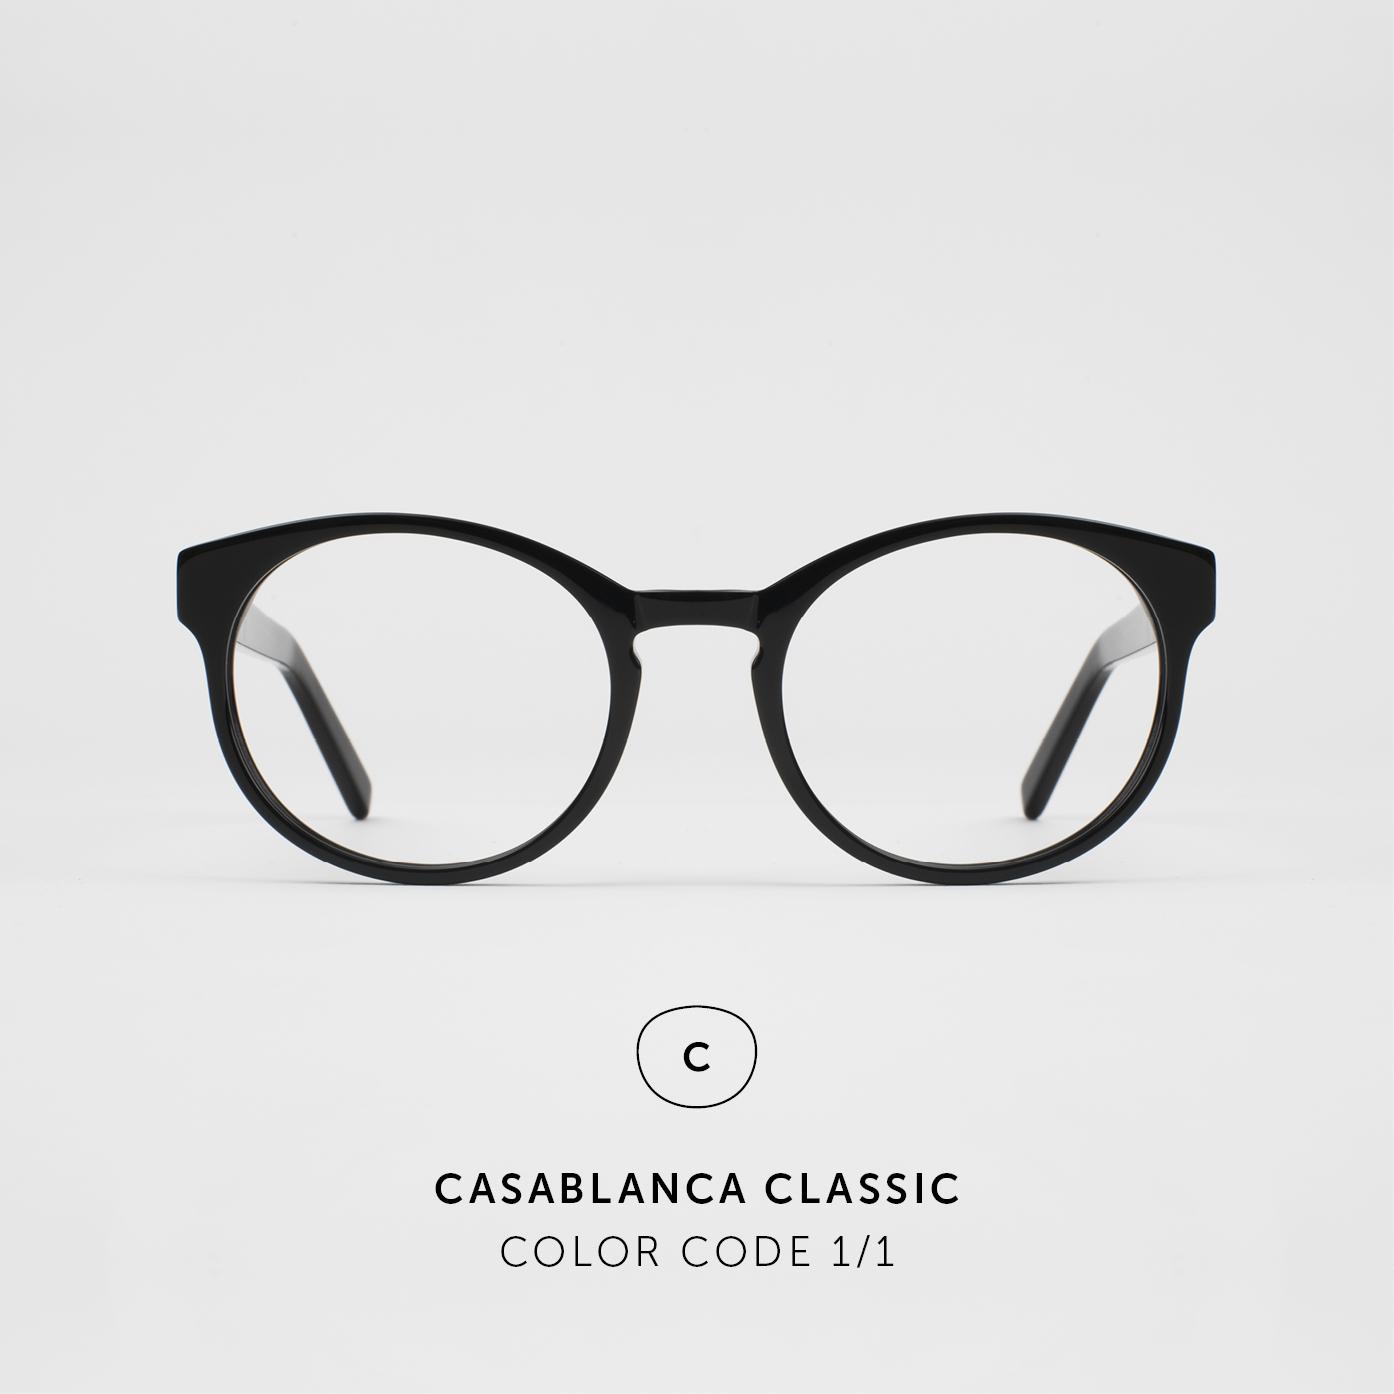 CasablancaClassic.jpg